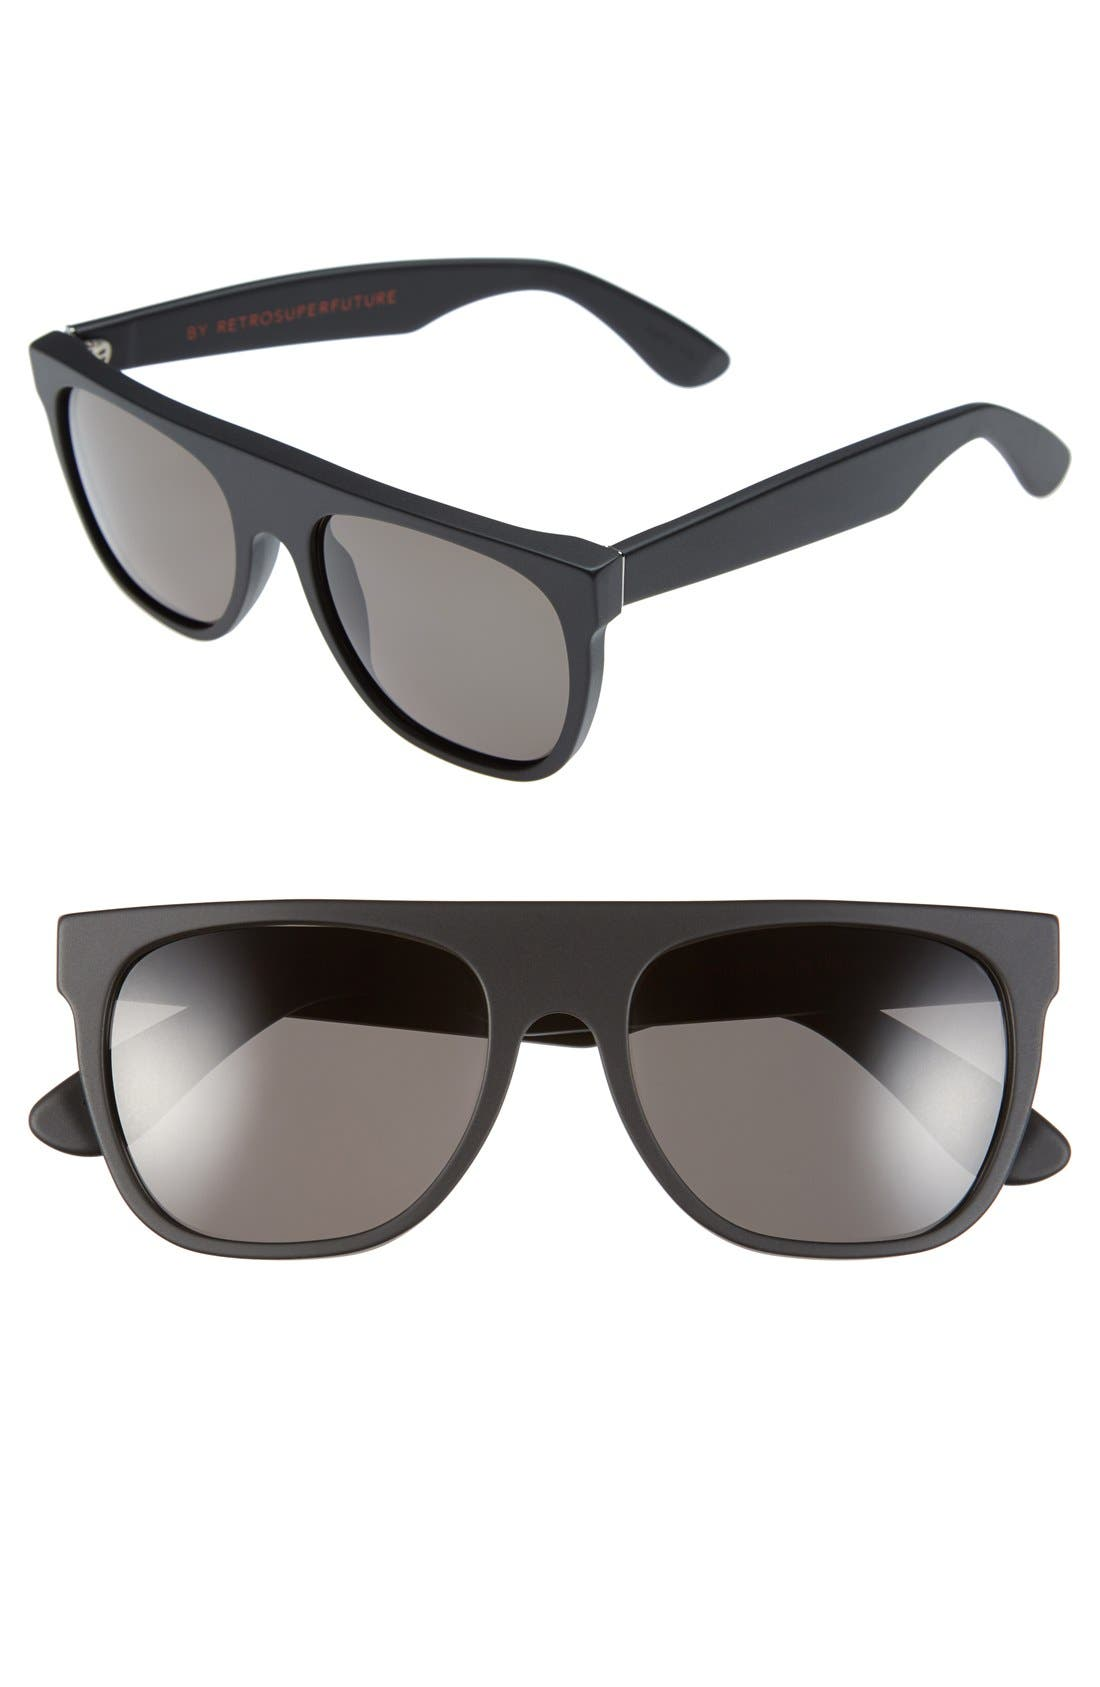 Alternate Image 1 Selected - SUPER by RETROSUPERFUTURE® 'Flat Top' 55mm Retro Sunglasses